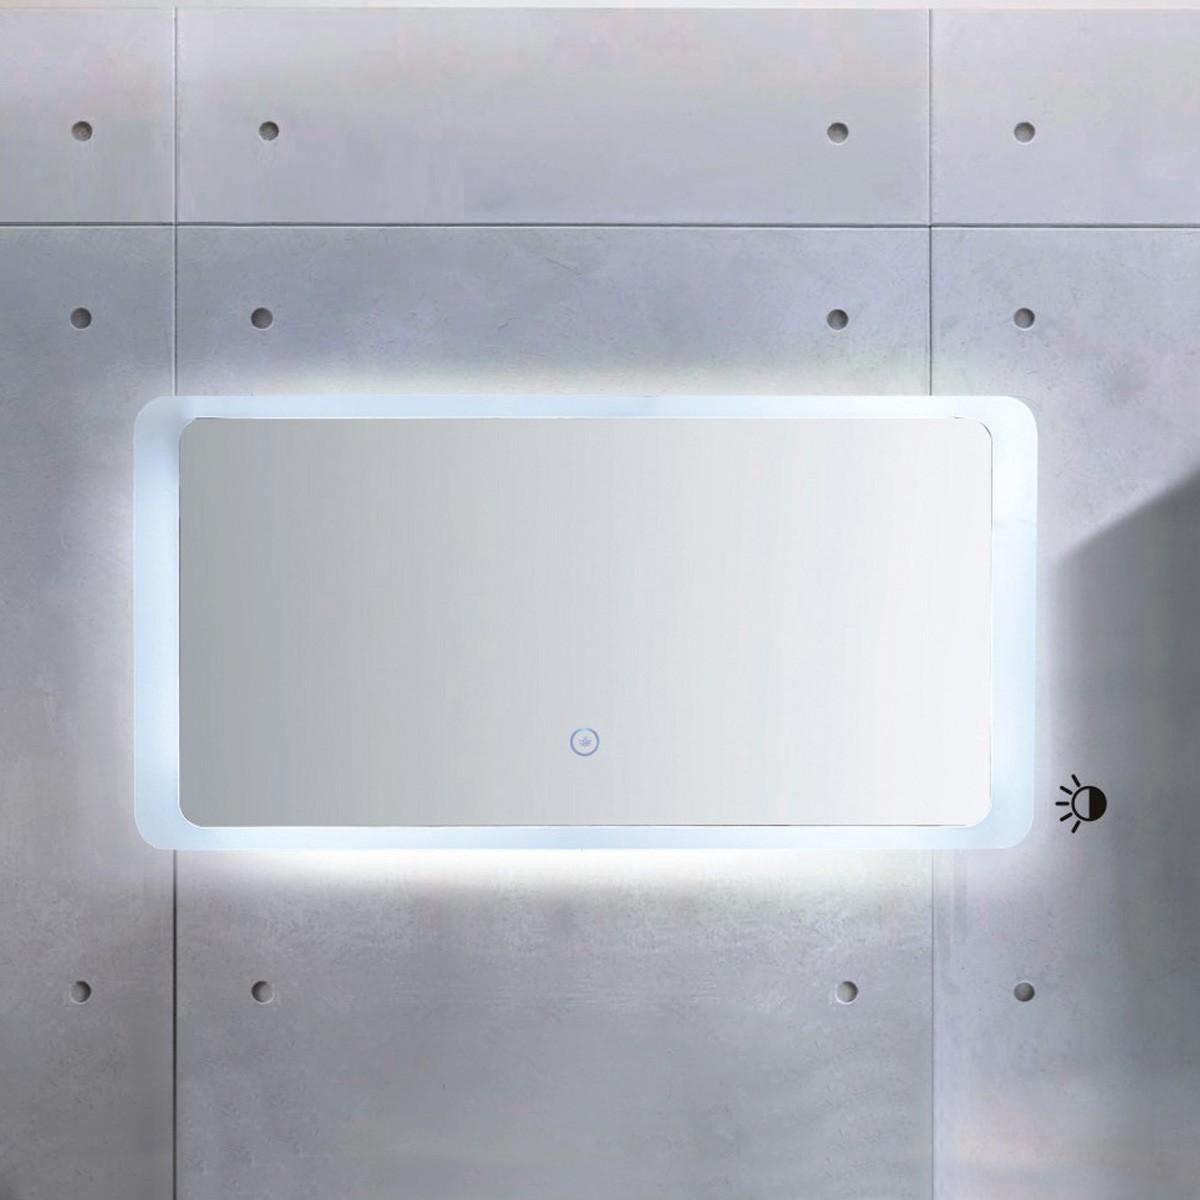 48 x 24 po Miroir à LED avec bouton tactile (ML1380-M)